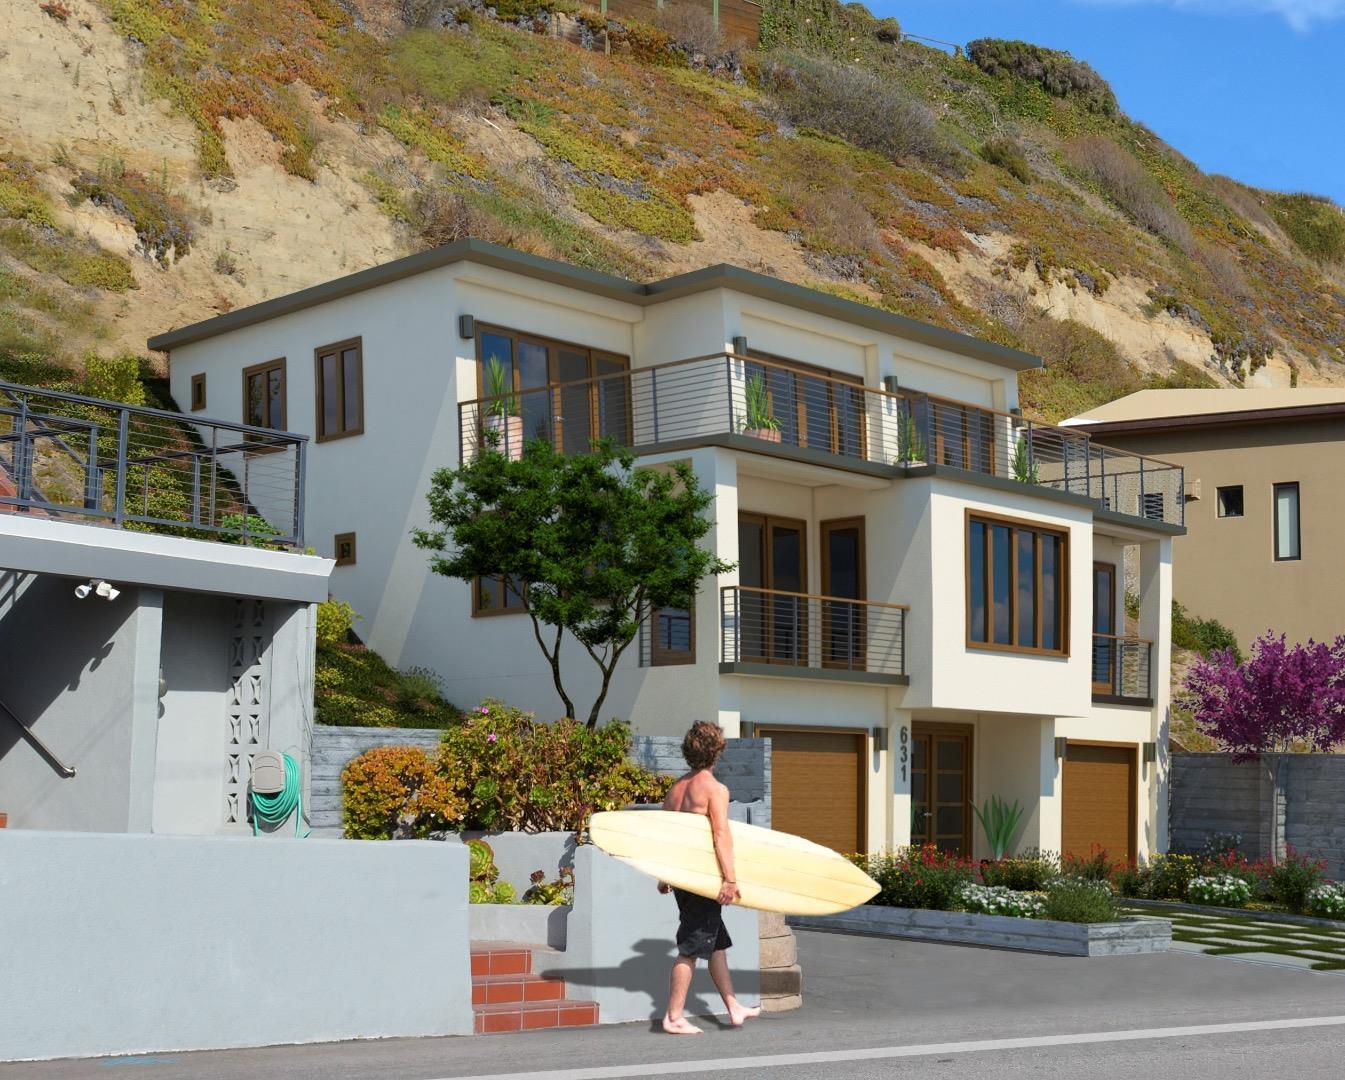 Single Family Home for Sale at 631 Beach Drive 631 Beach Drive Aptos, California 95003 United States